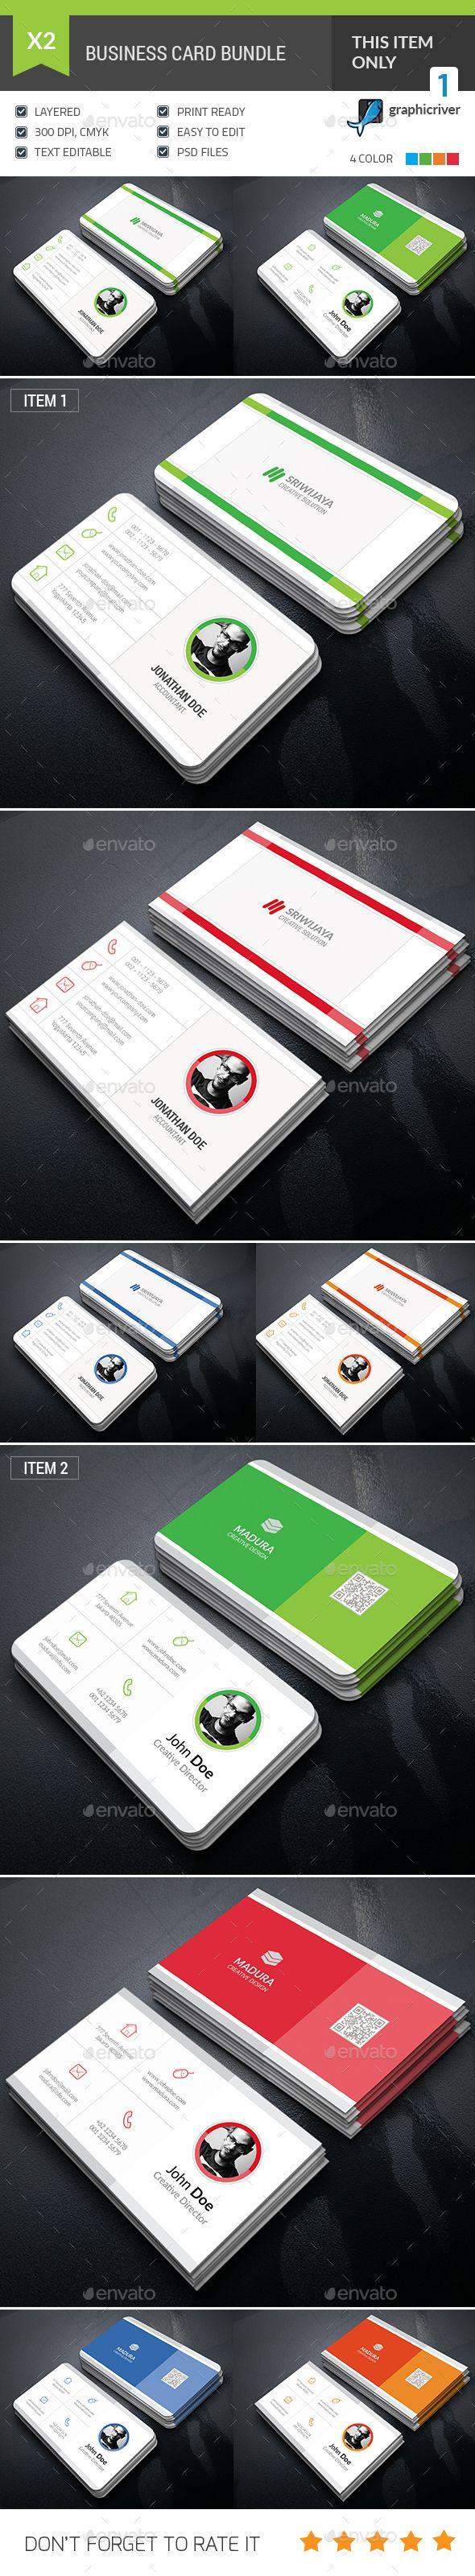 Business Card Bundle Templates PSD. Download here: http://graphicriver.net/item/business-card-bundle/16665864?ref=ksioks